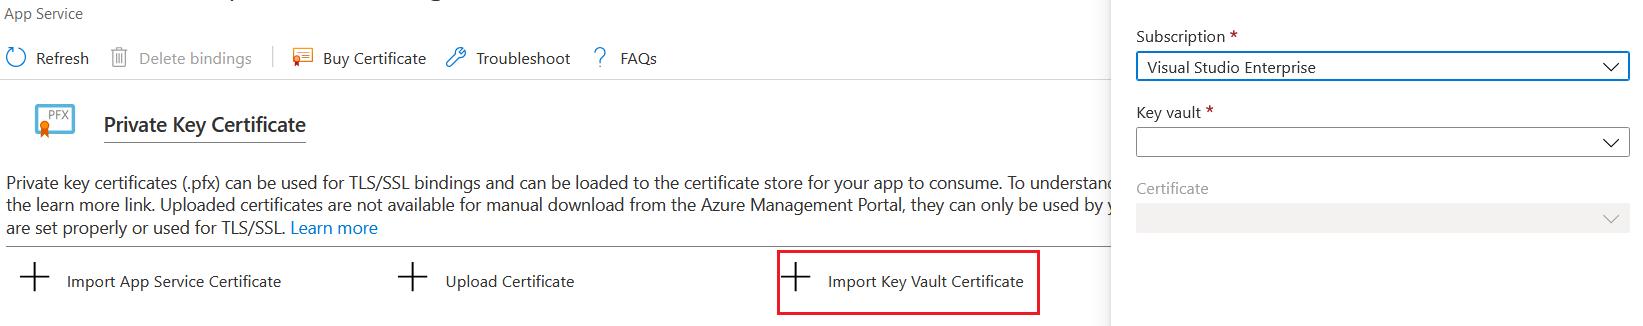 Import Key Vault Certificate